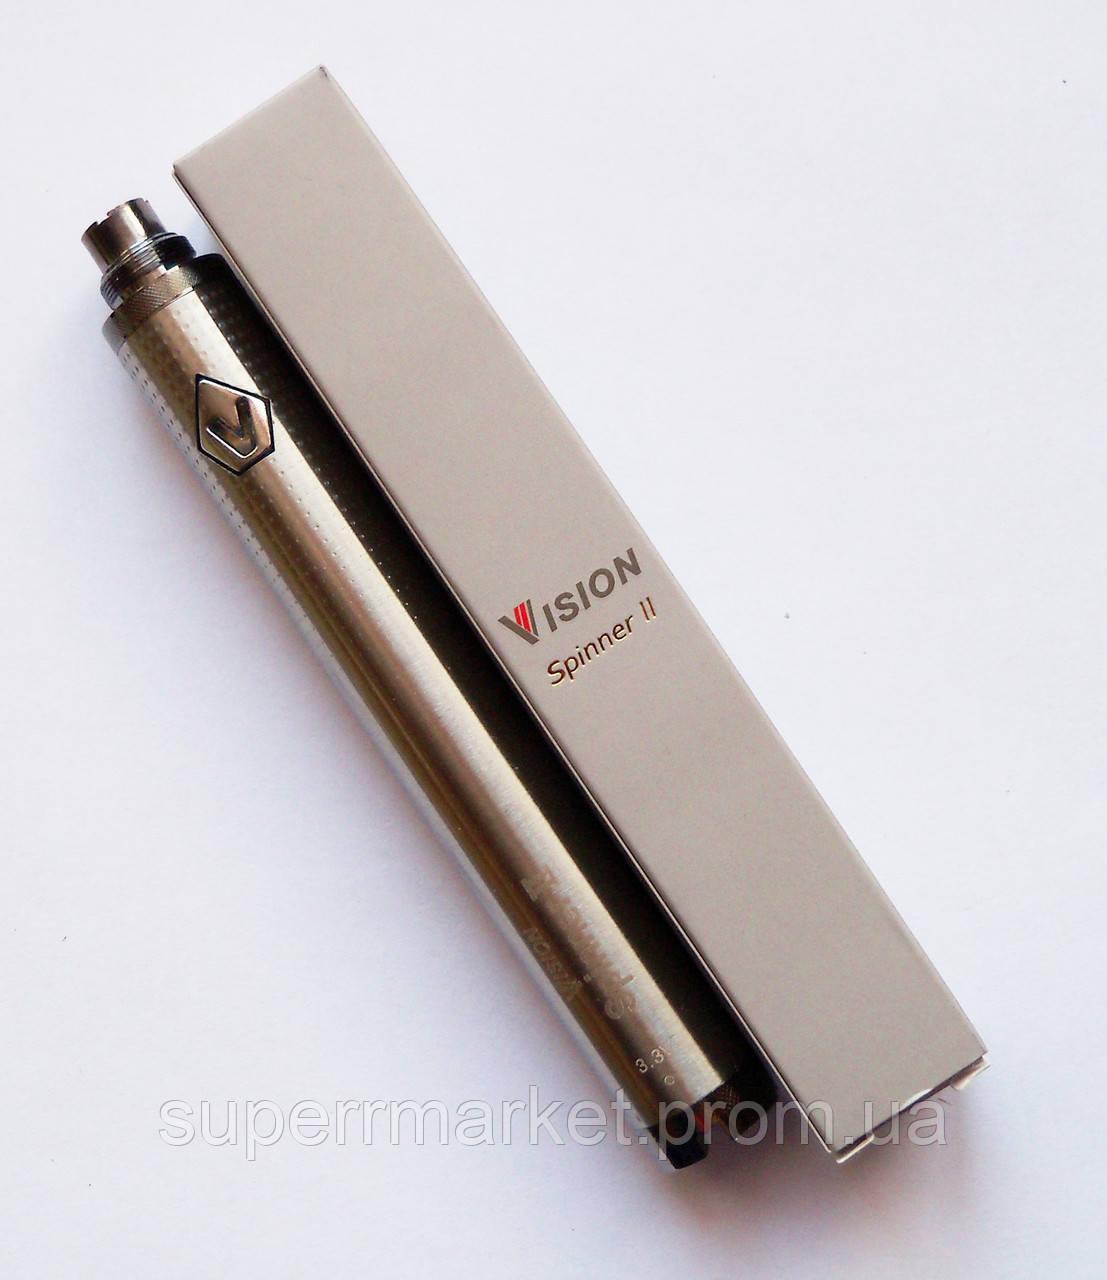 Аккумулятор для электронной сигареты Vision Spinner II  варивольт 1600mAh  VISON